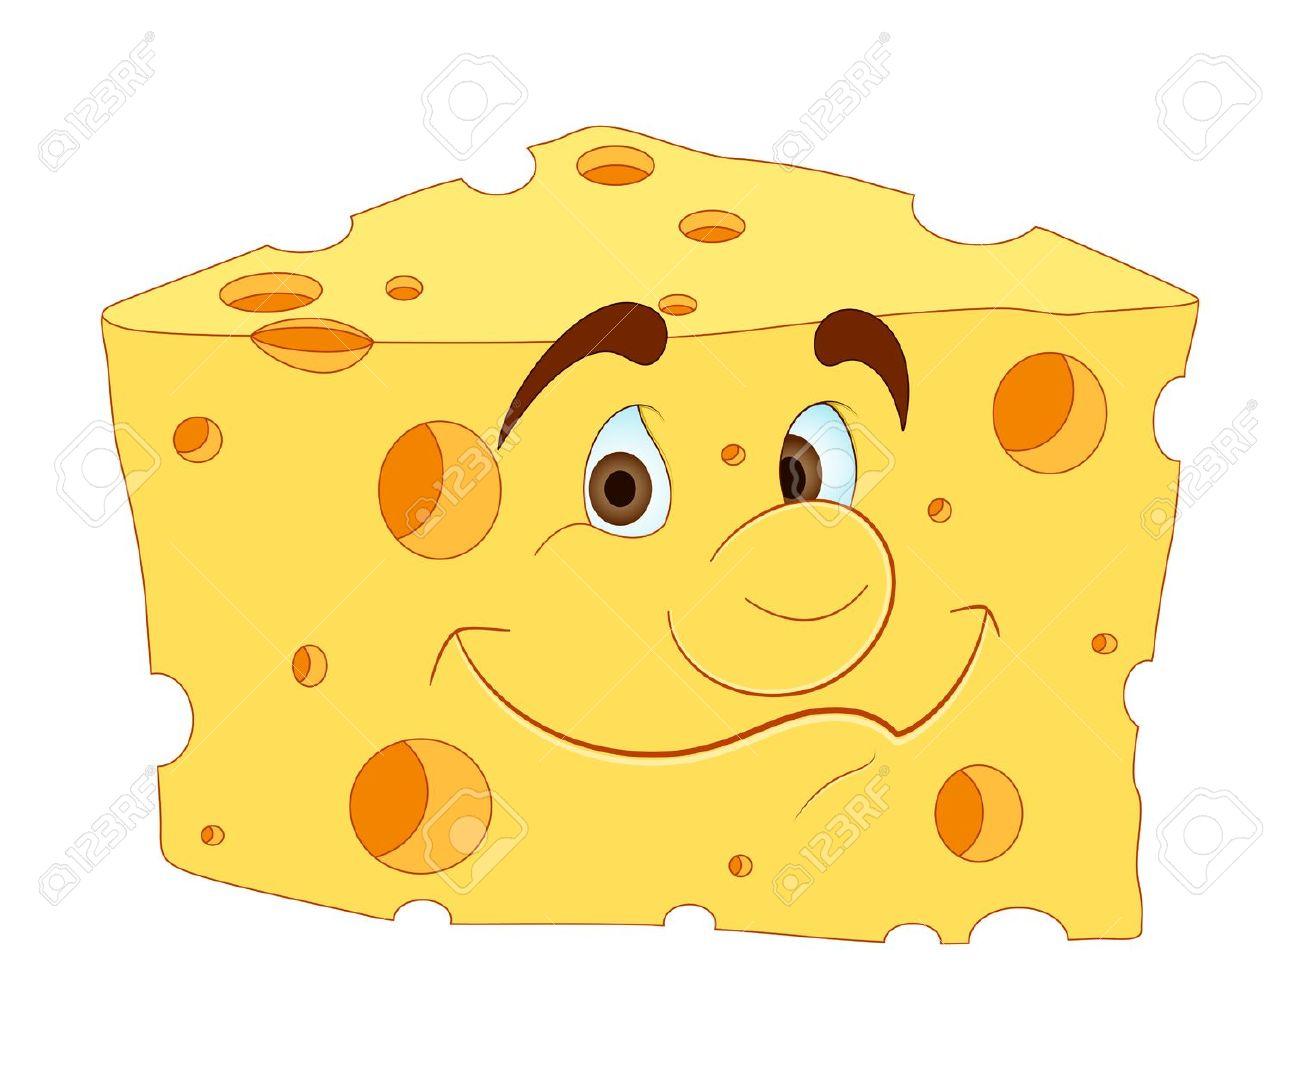 Cartoon Cheese Royalty Free Cliparts, Vectors, And Stock.